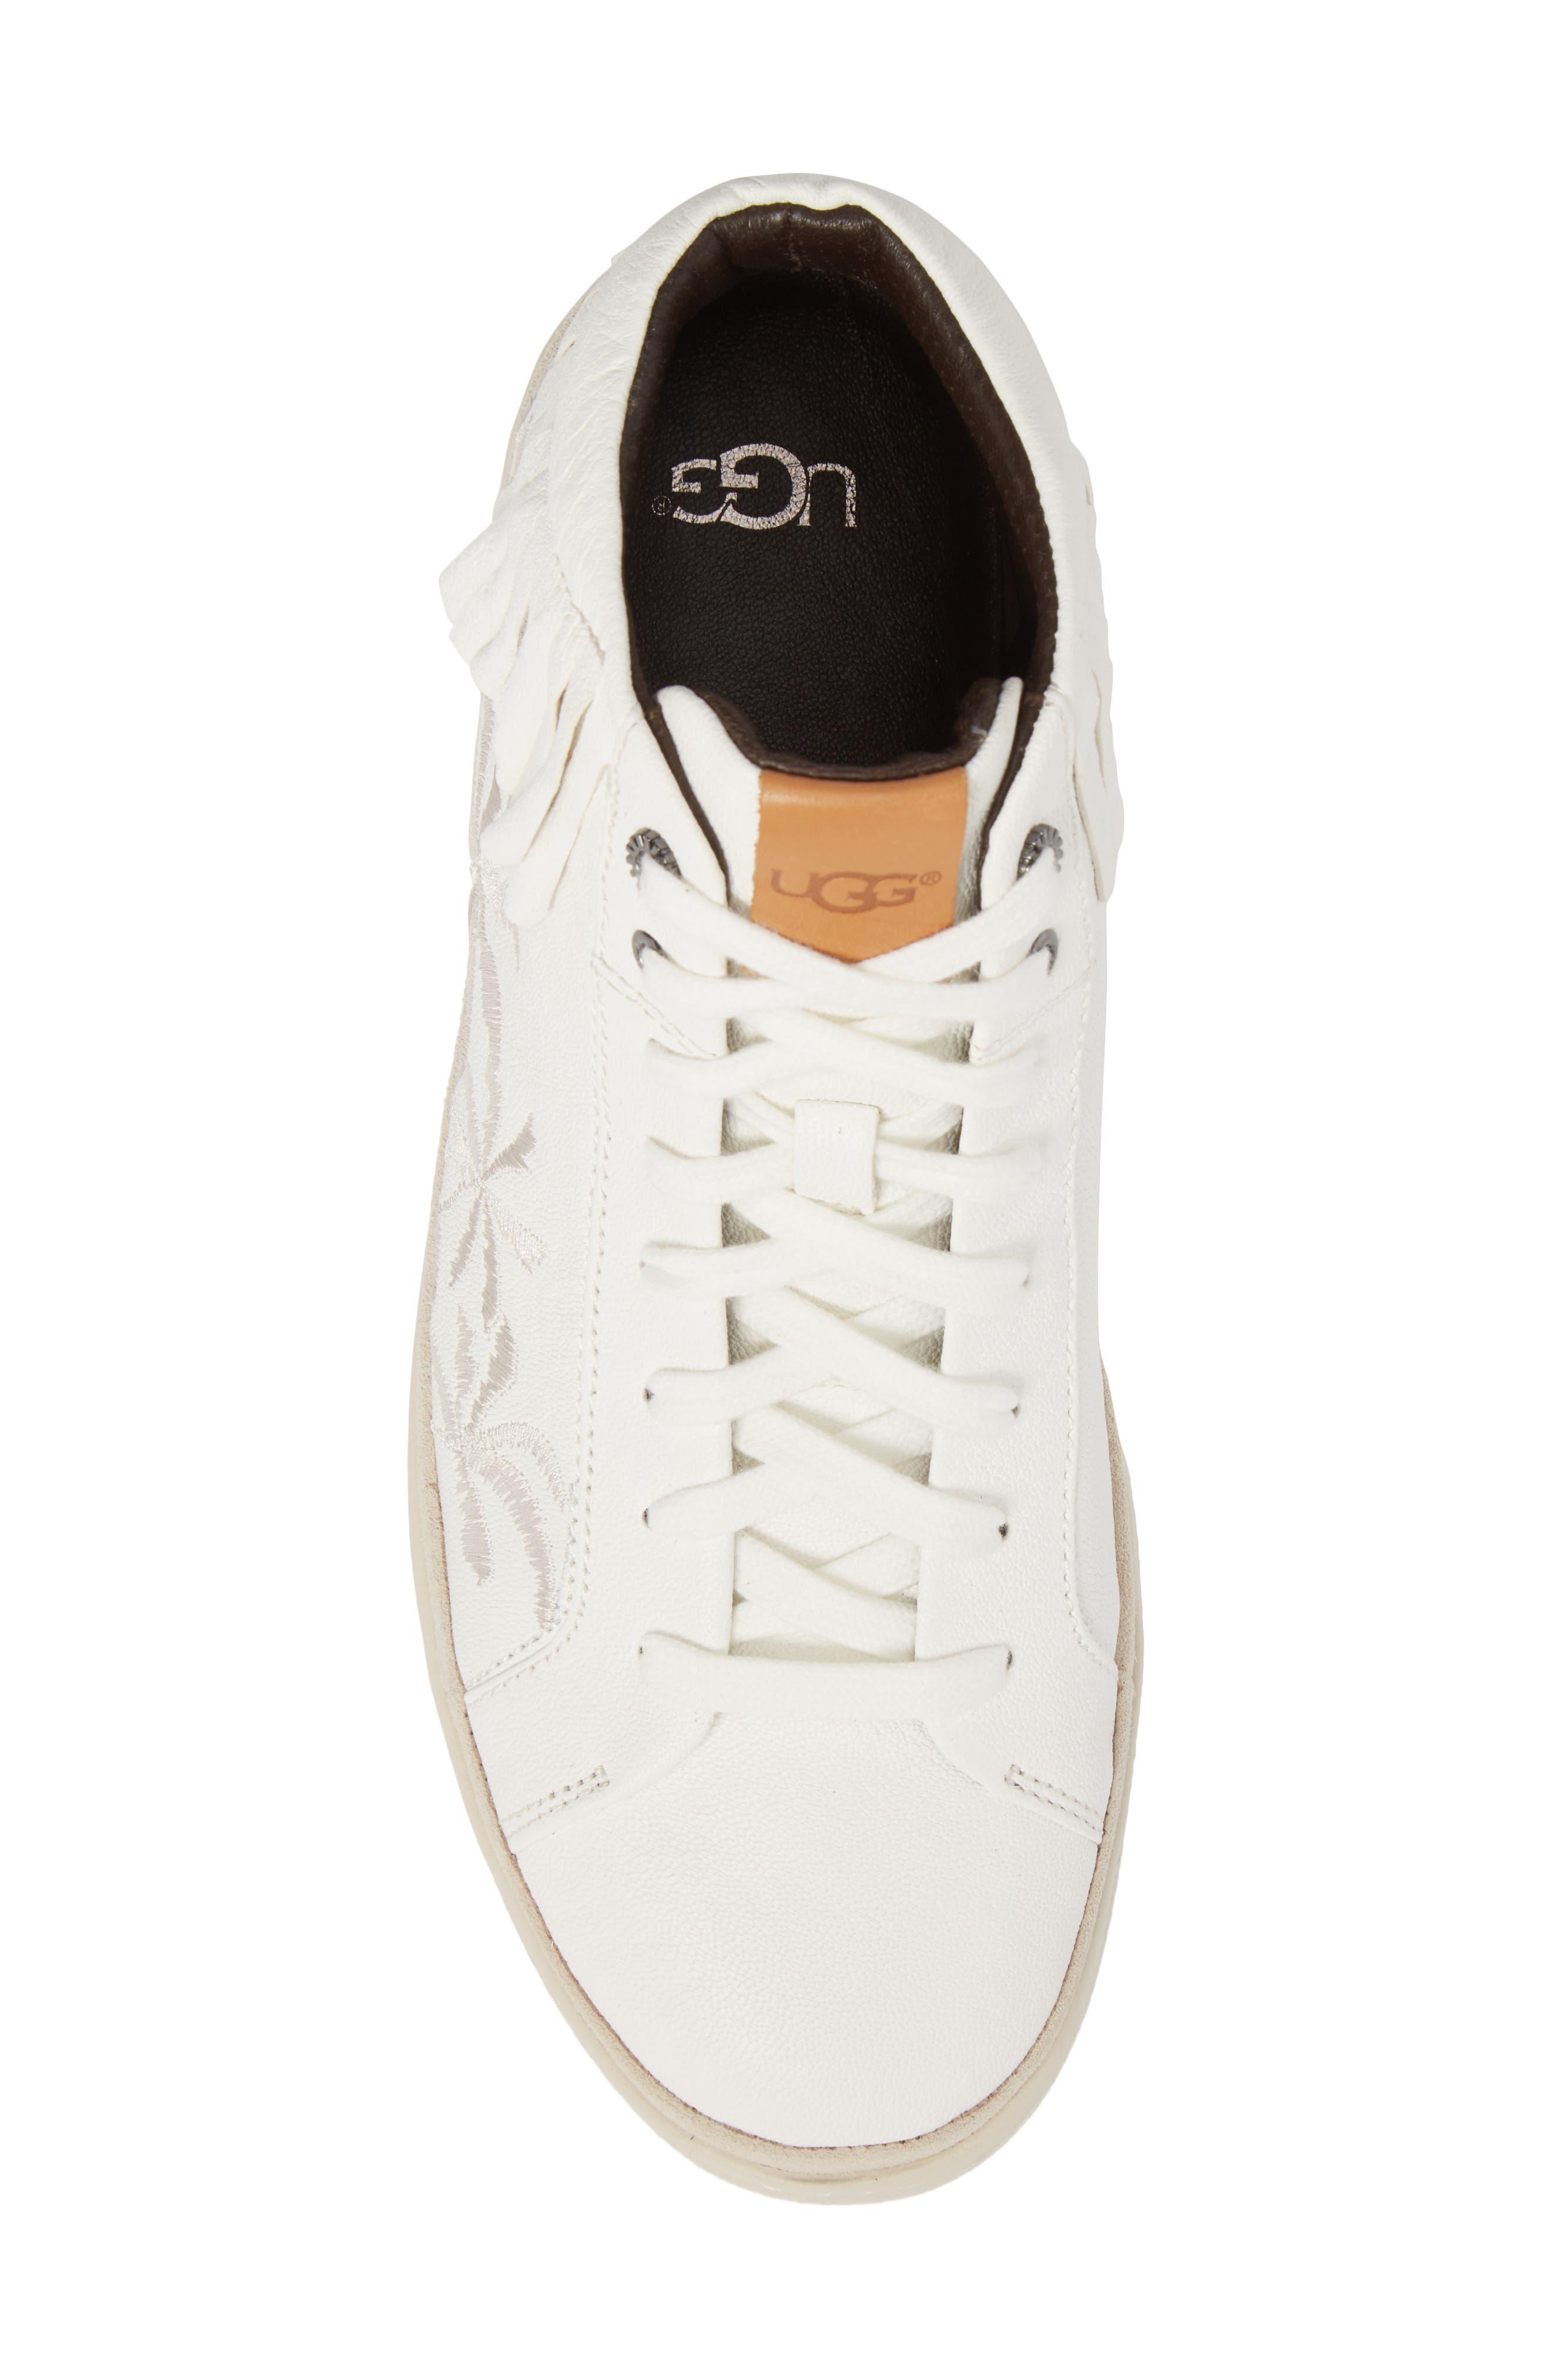 Cali Fringe High Top Sneaker,                             Alternate thumbnail 5, color,                             White Leather